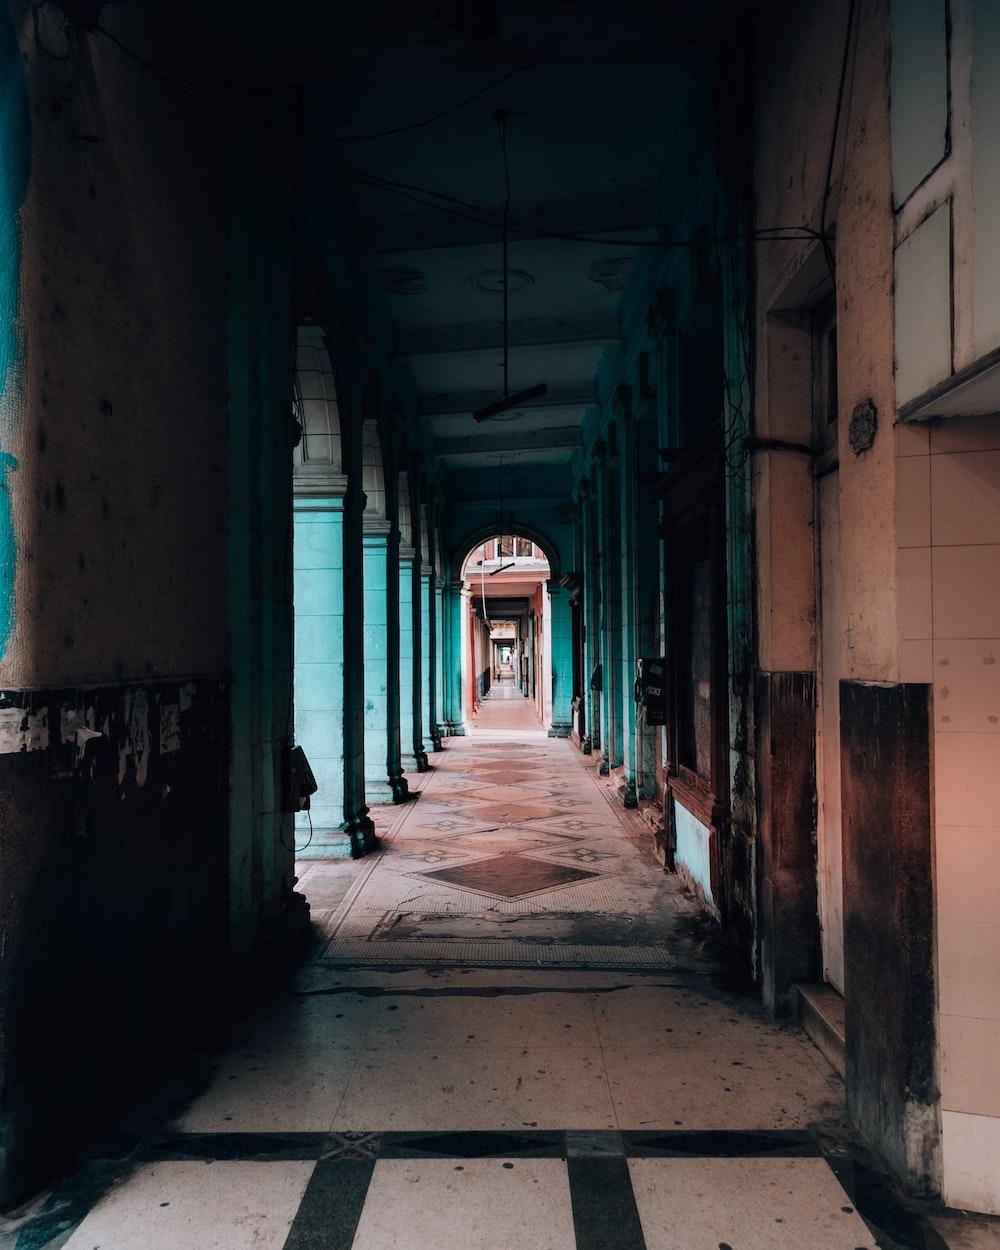 empty hallway with red columns